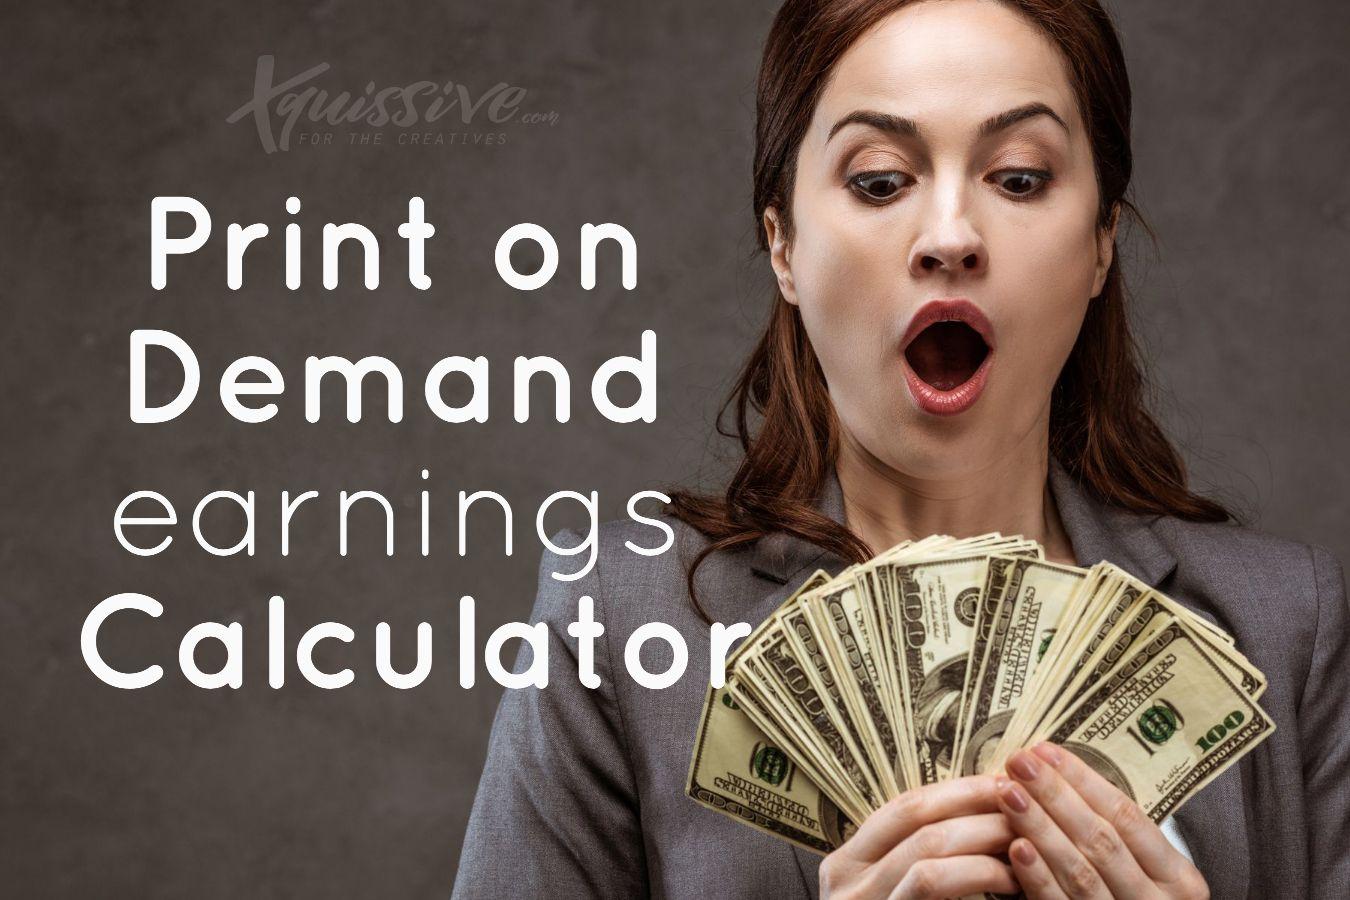 Print on Demand Earnings Calculator